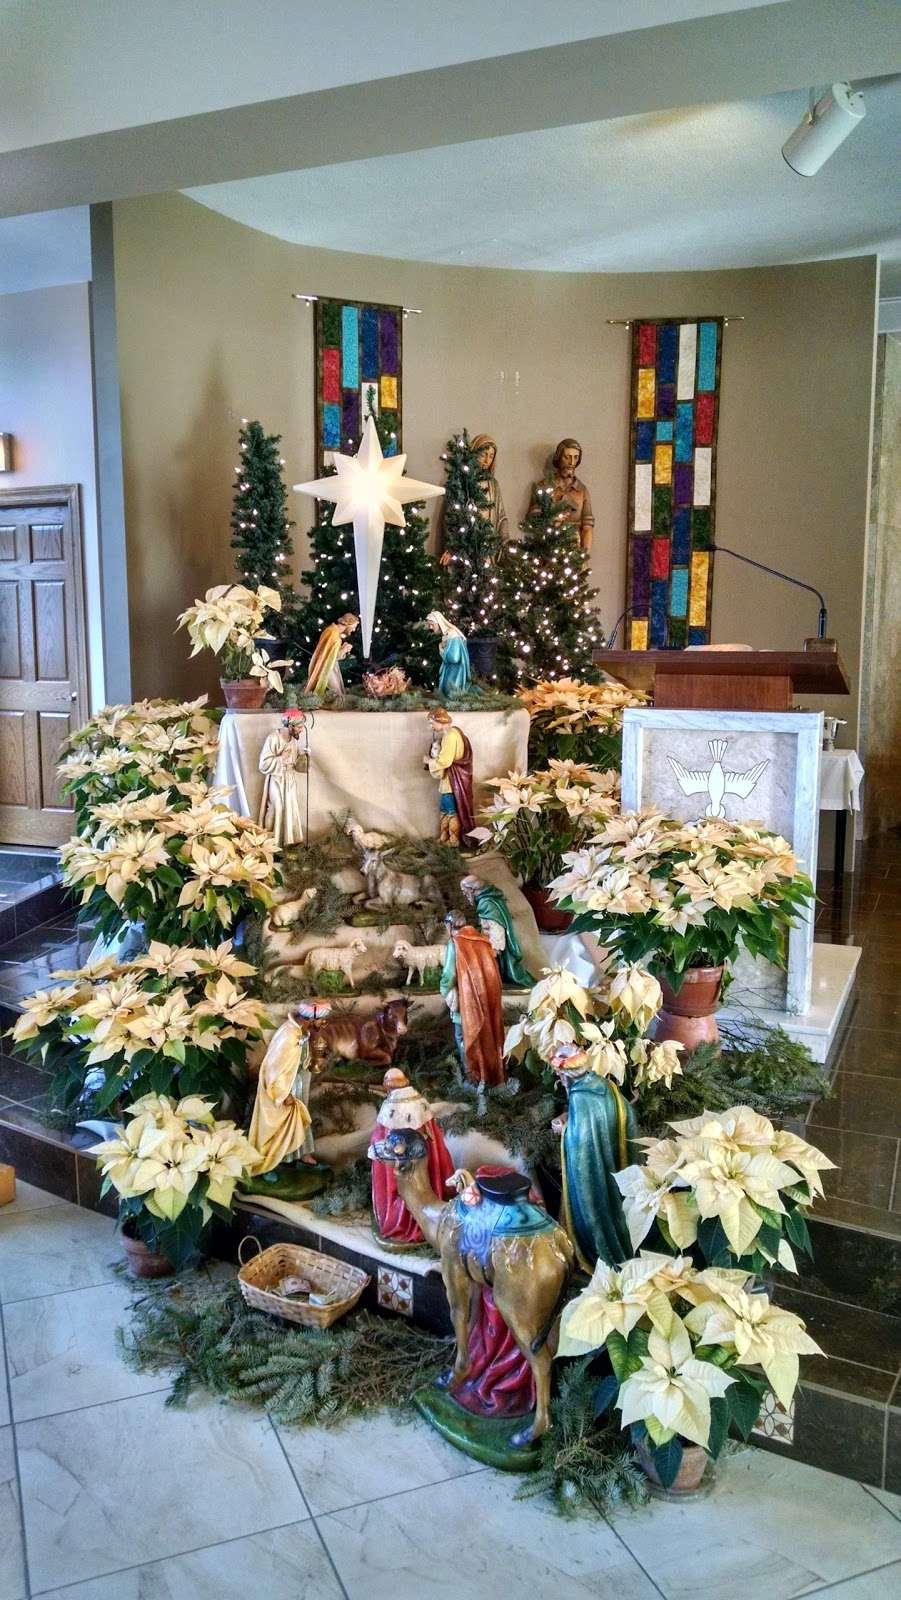 Divine Savior Catholic Church - church  | Photo 6 of 10 | Address: 7740 W Montrose Ave, Harwood Heights, IL 60706, USA | Phone: (708) 456-9000